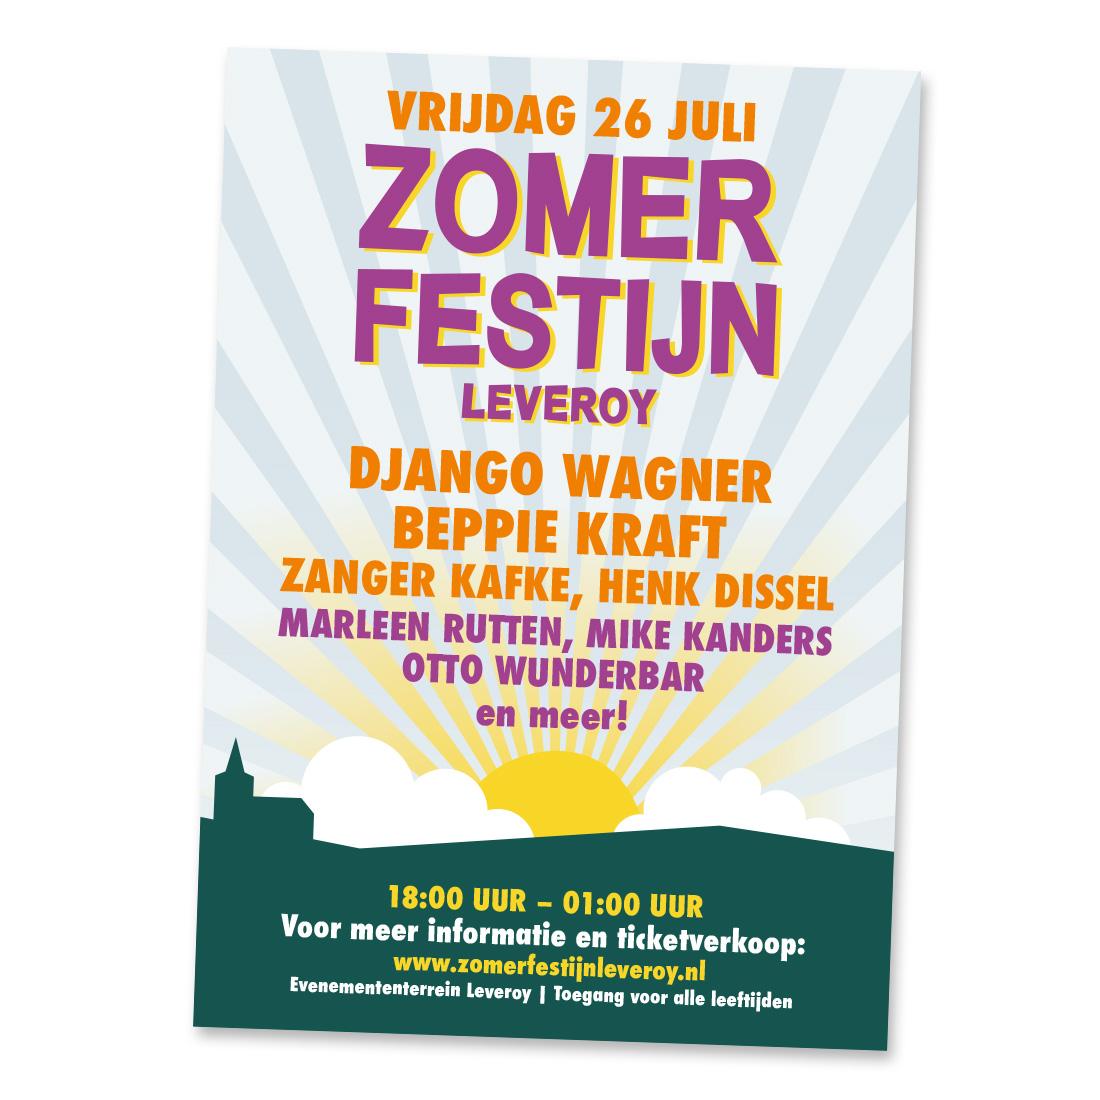 Poster Zomerfestijn Leveroy